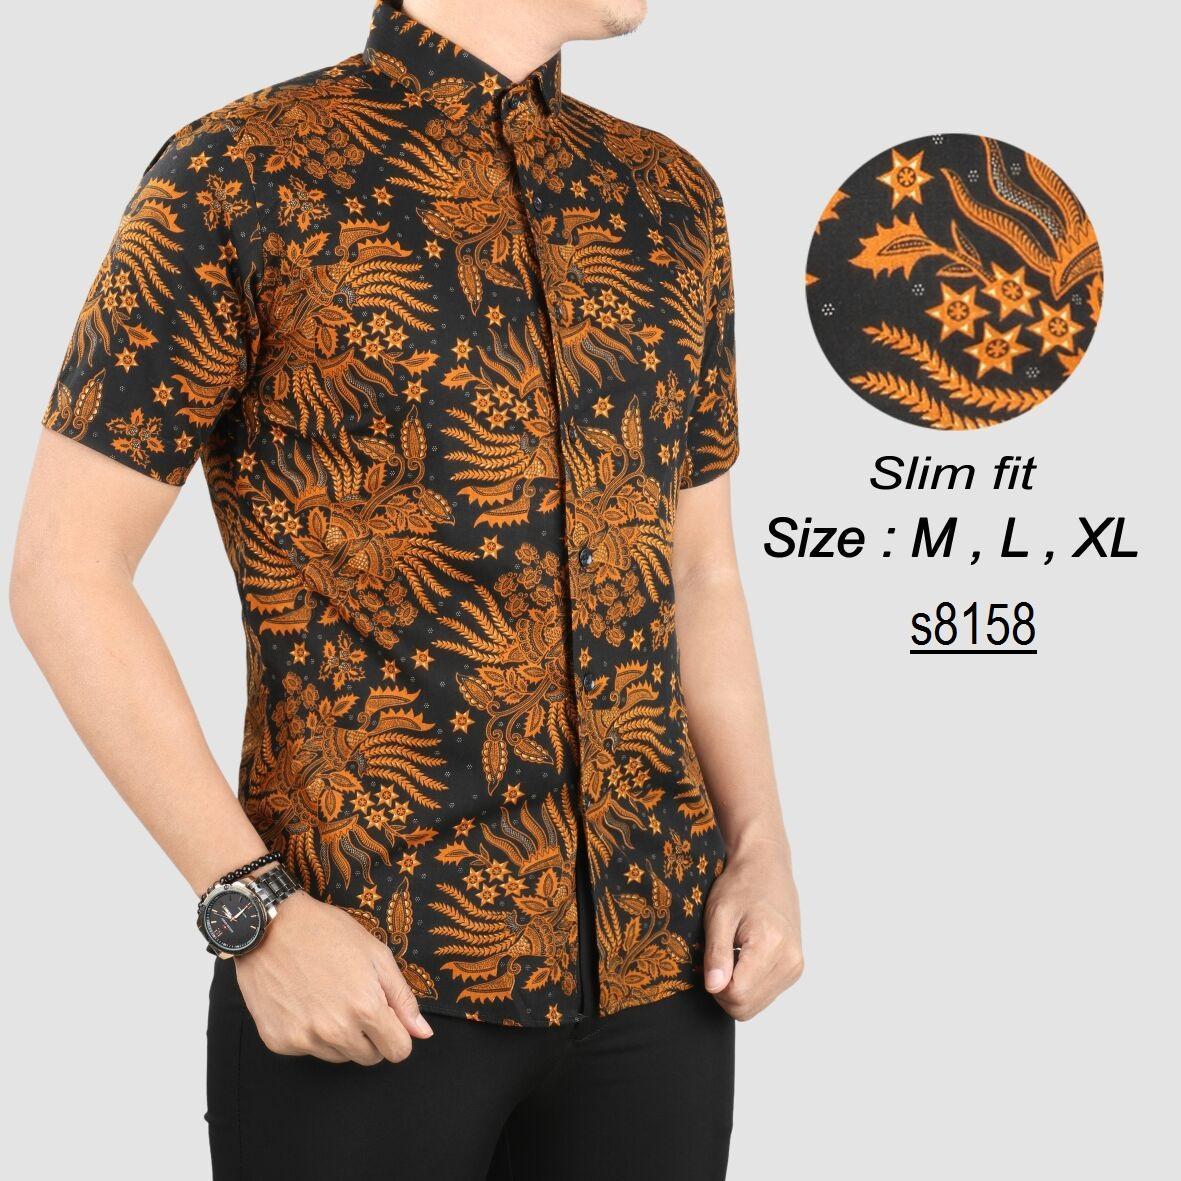 Baju Batik Modern Kemeja Pria Slim fit WaW